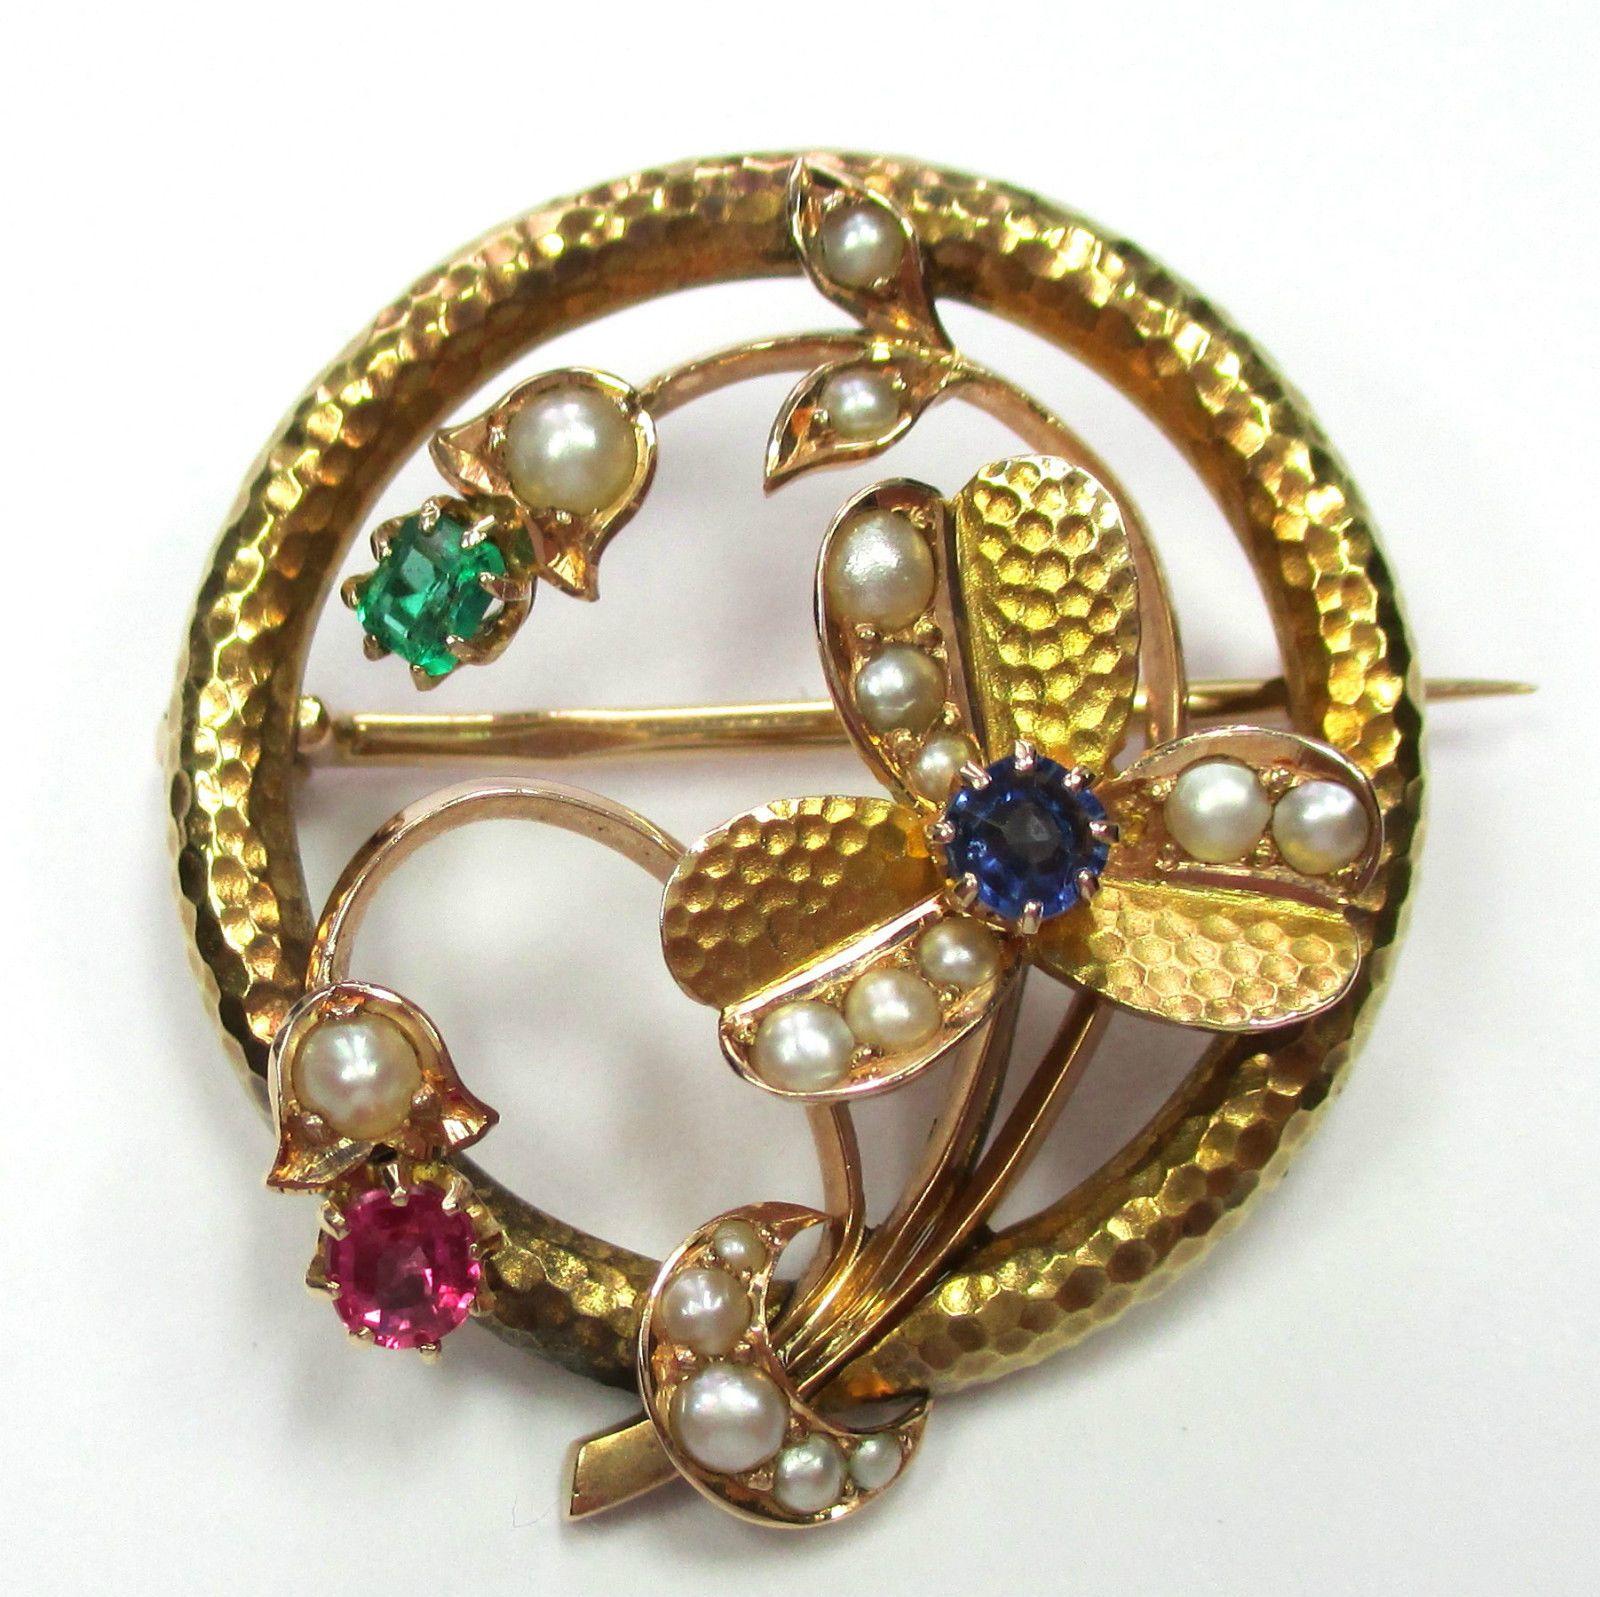 718 Zauberhafte Antike Brosche Gold 585 Smaragd Rubin Saphir Perlen Video 1365 Brosche Smaragd Perlen